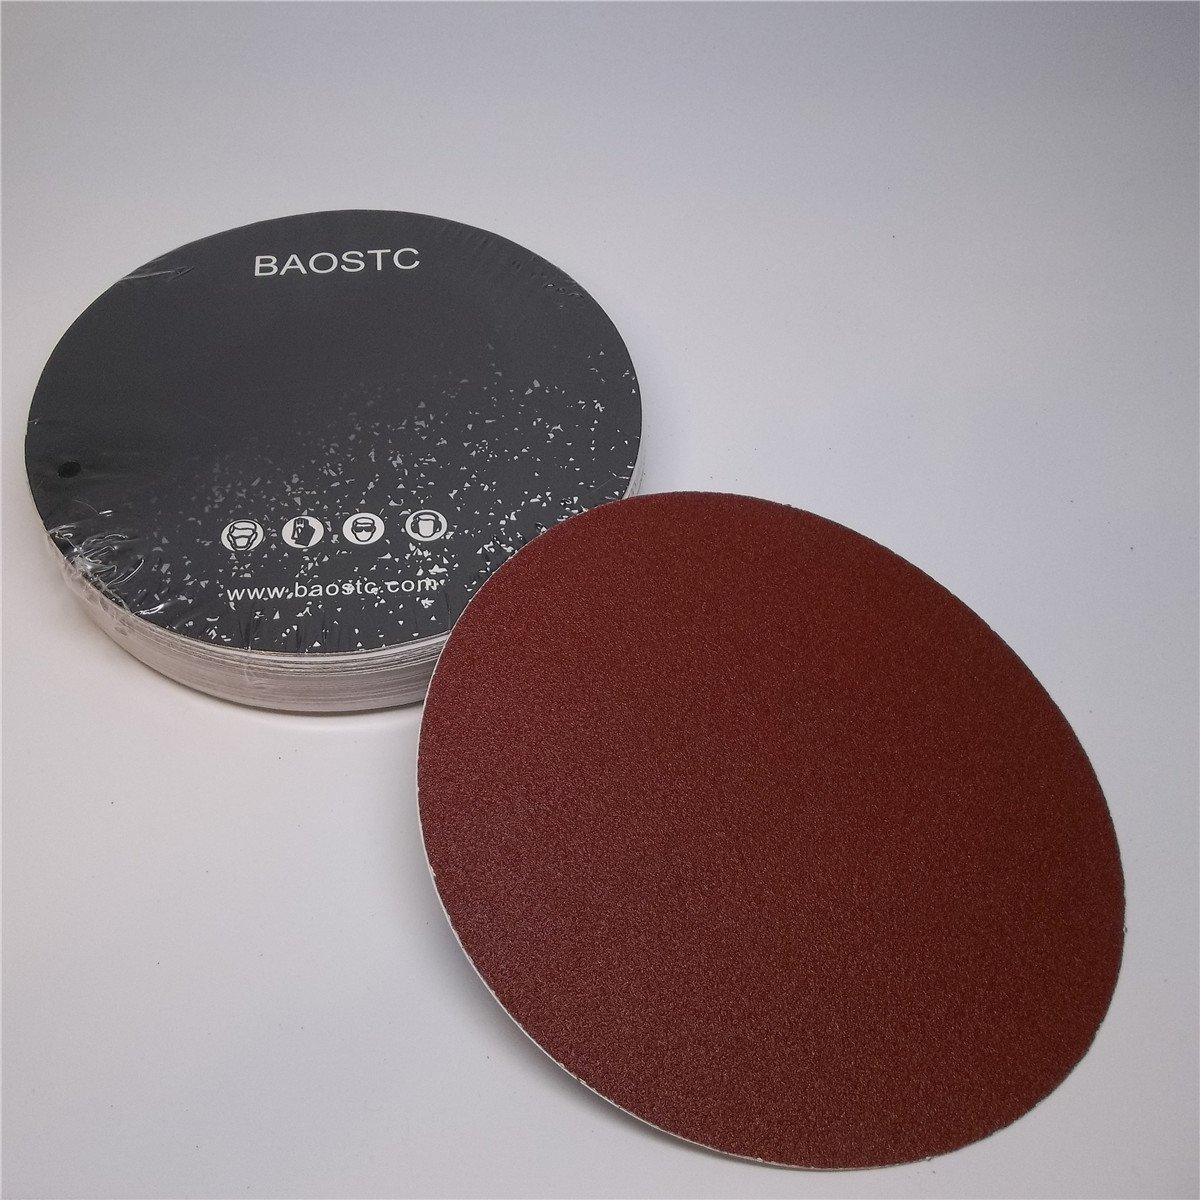 BAOSTC 6' no holes P80 PSA sanding disc, red aluminum oxide, 50PACK